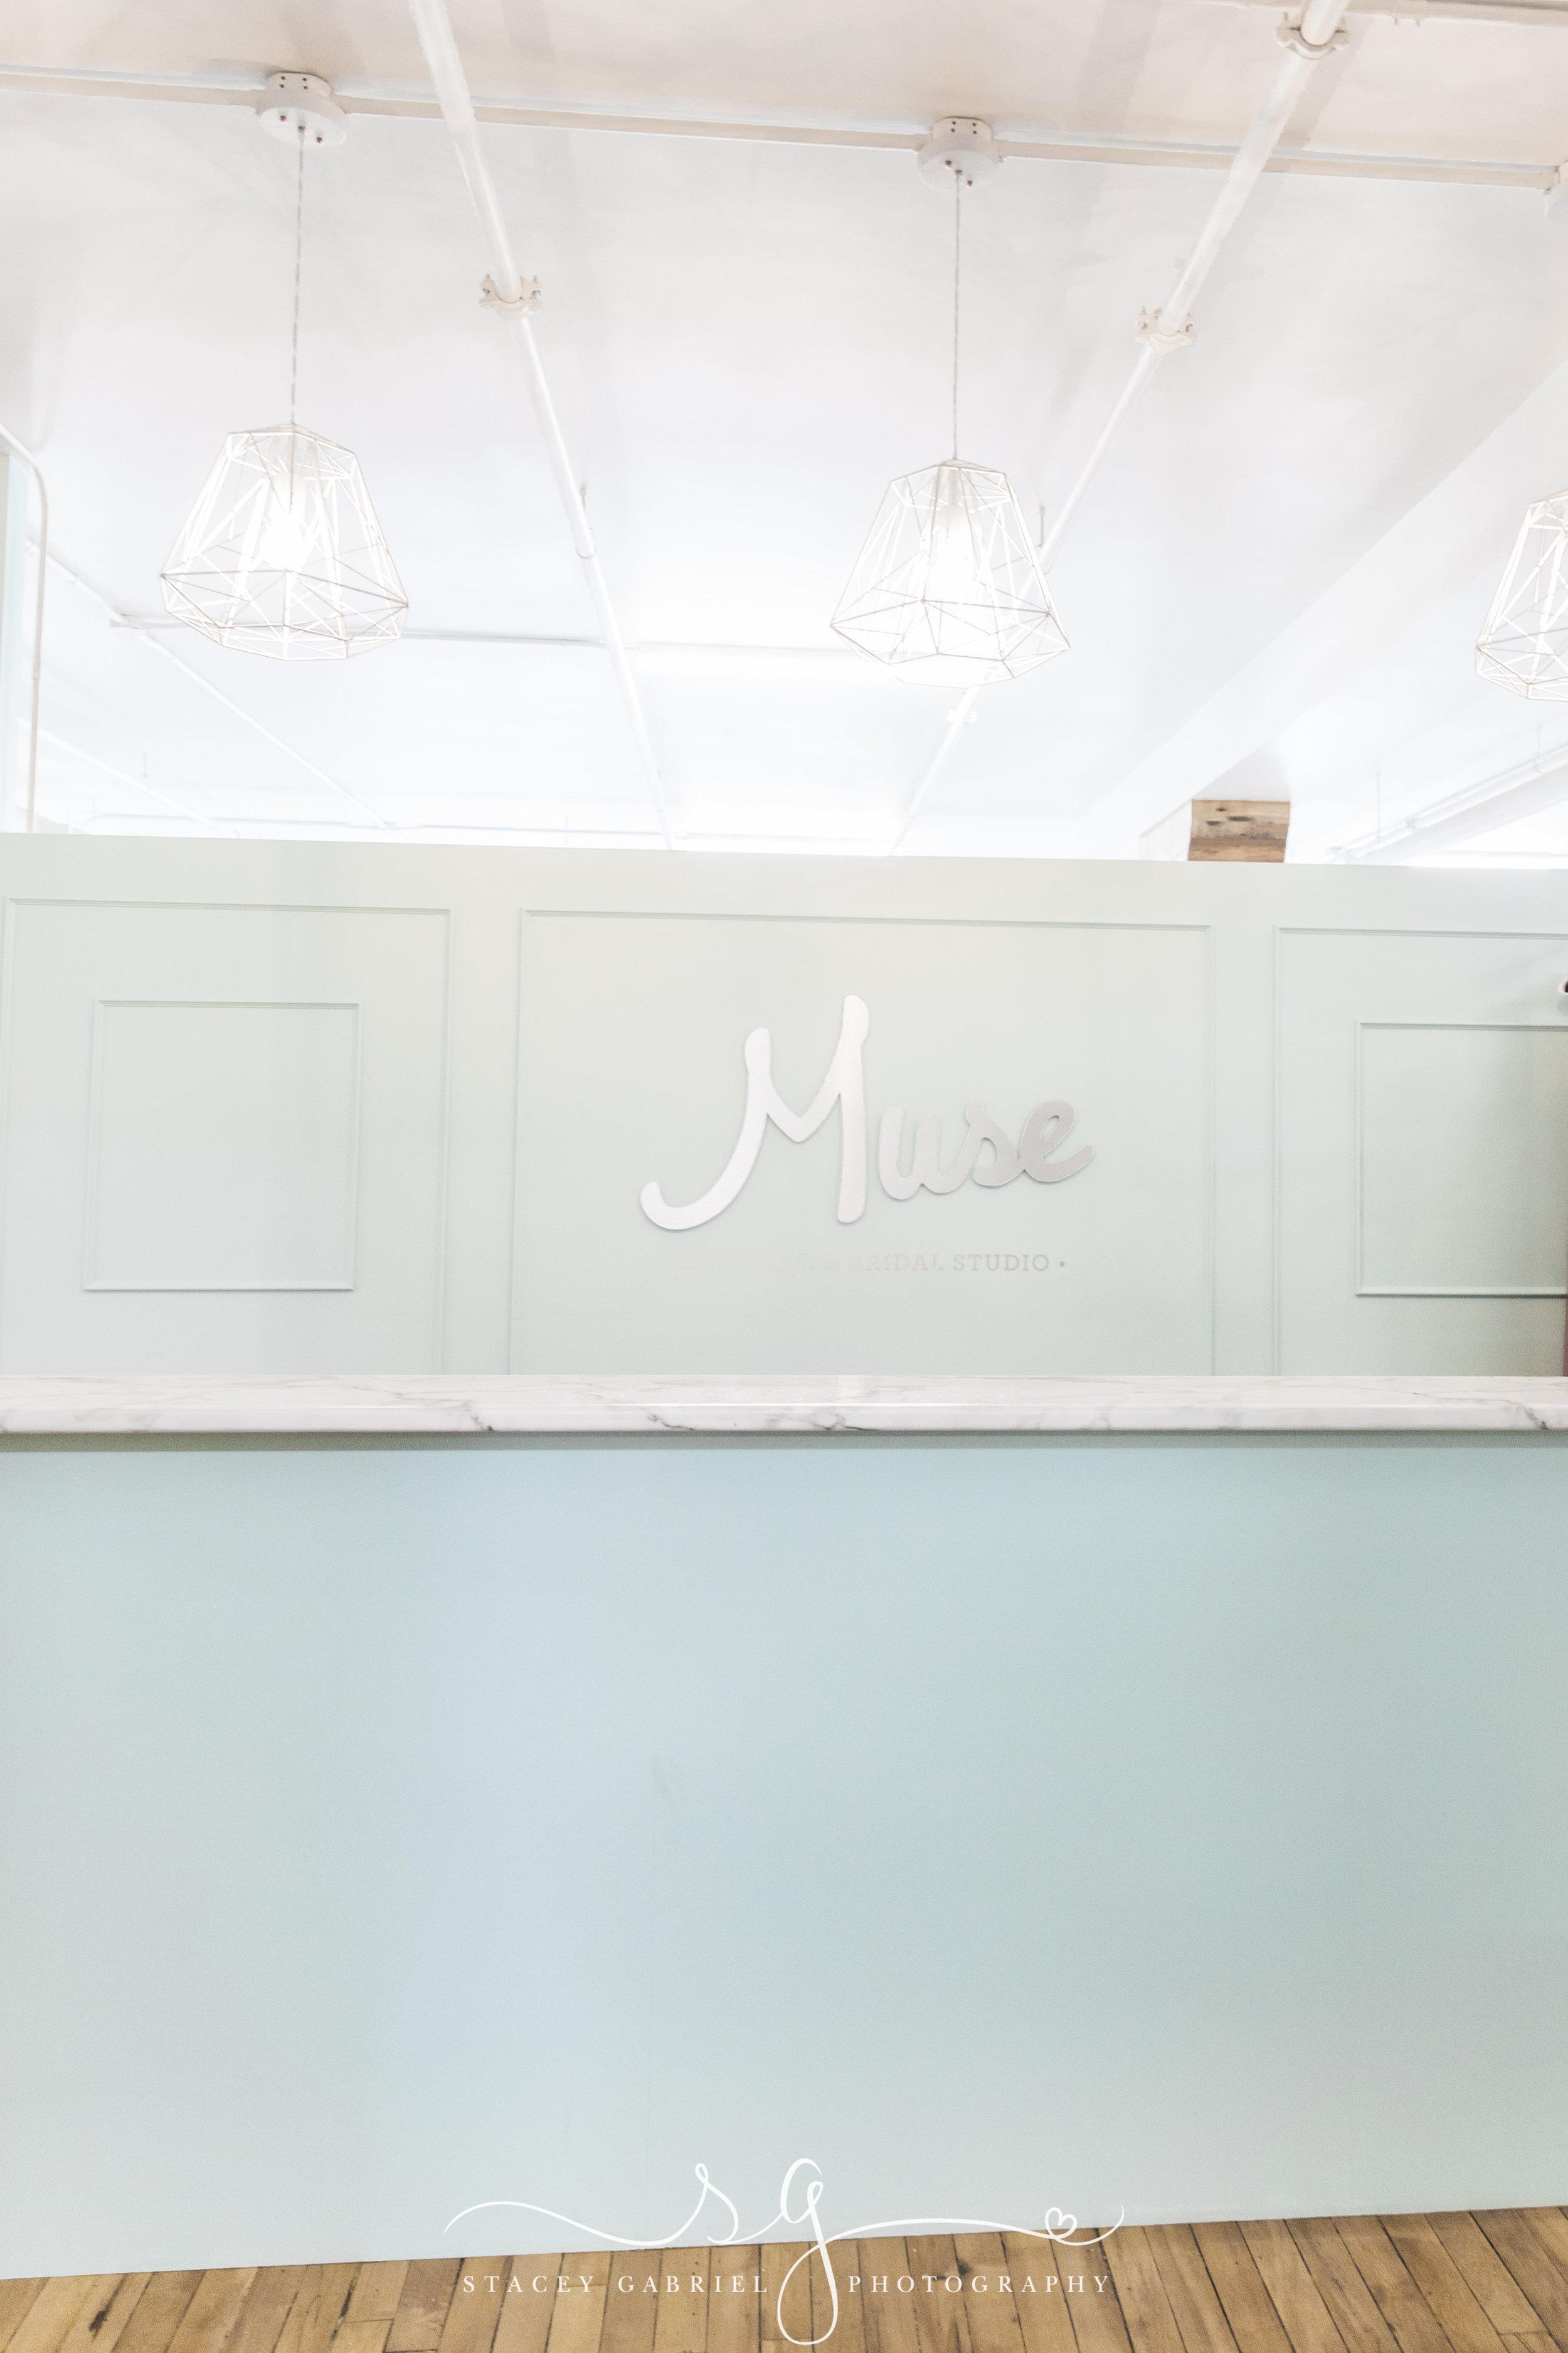 Muse Logo-done1-0064.jpg